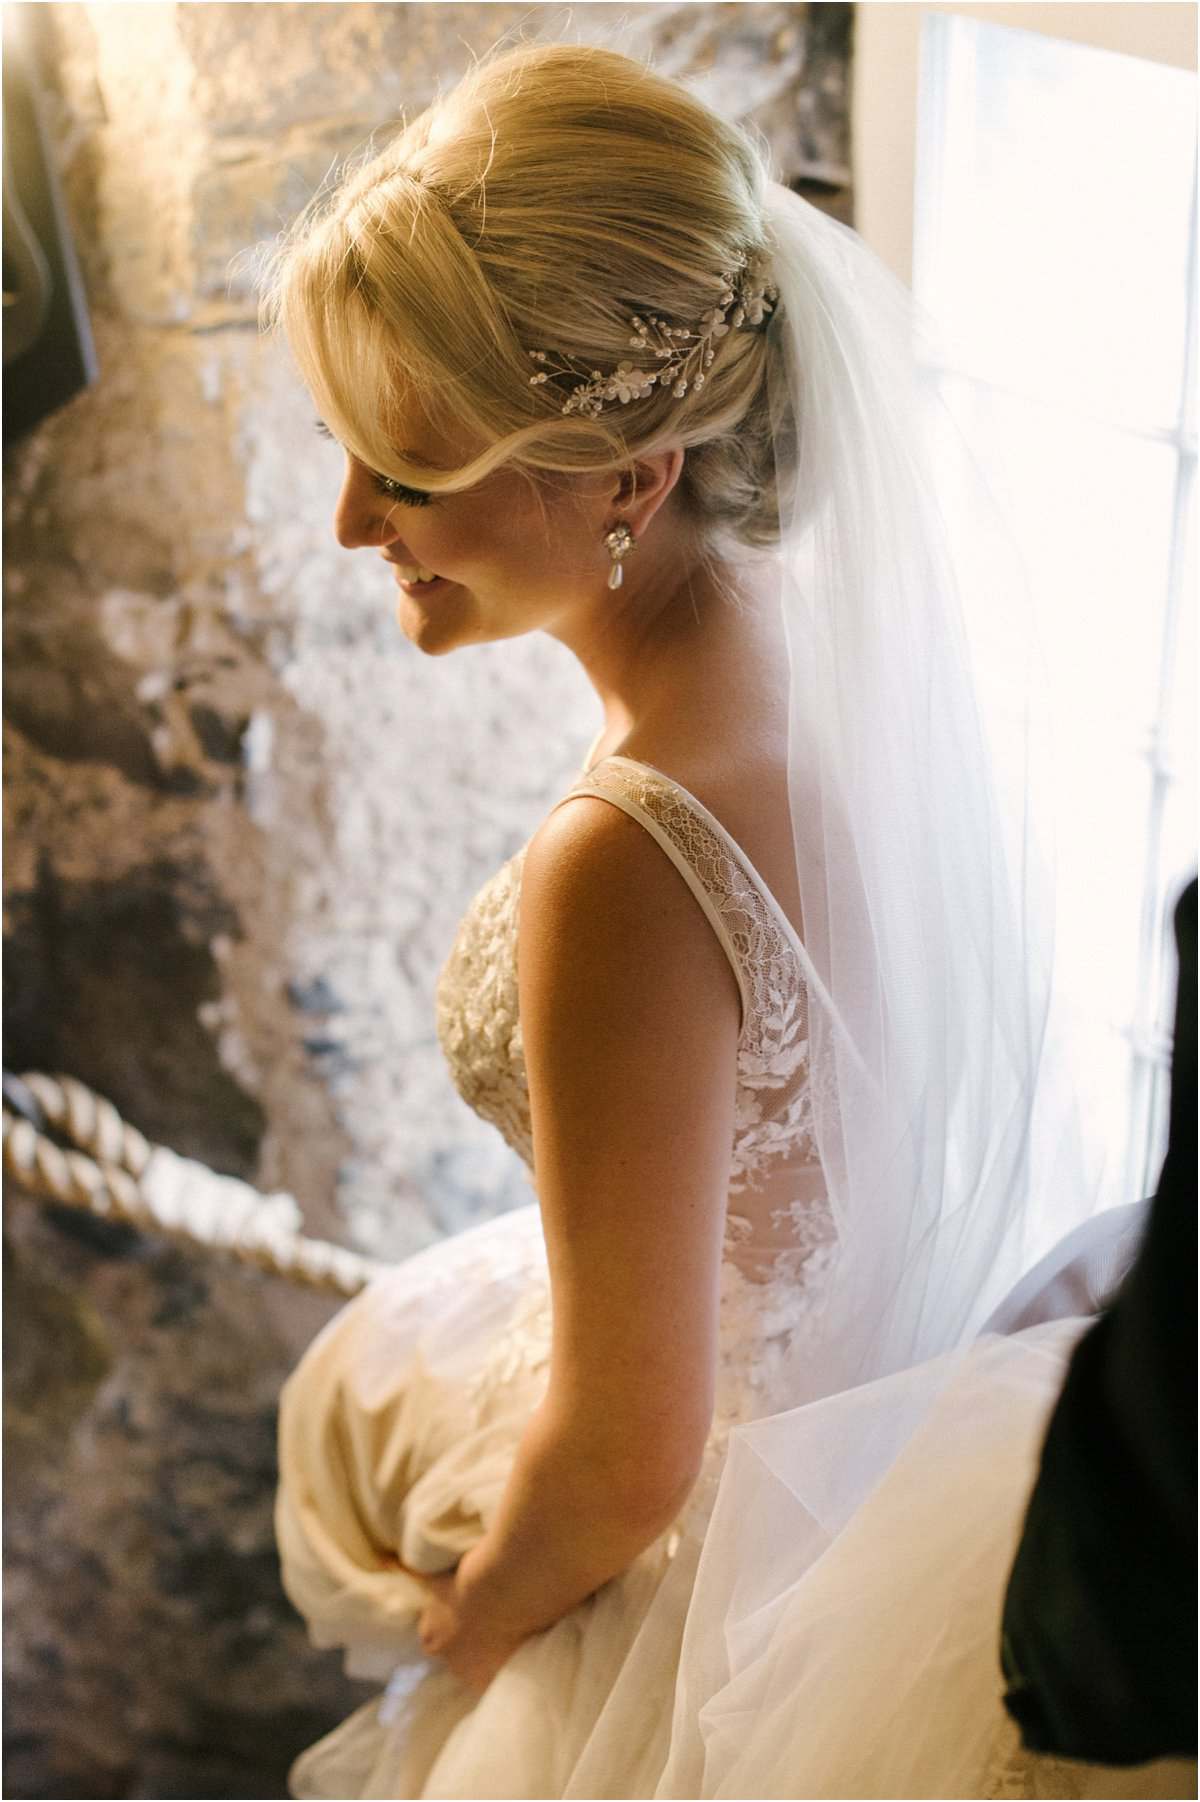 Crofts&Kowalczyk_DundasCastle_WeddingPhotography_Hannah&Tom-60.jpg